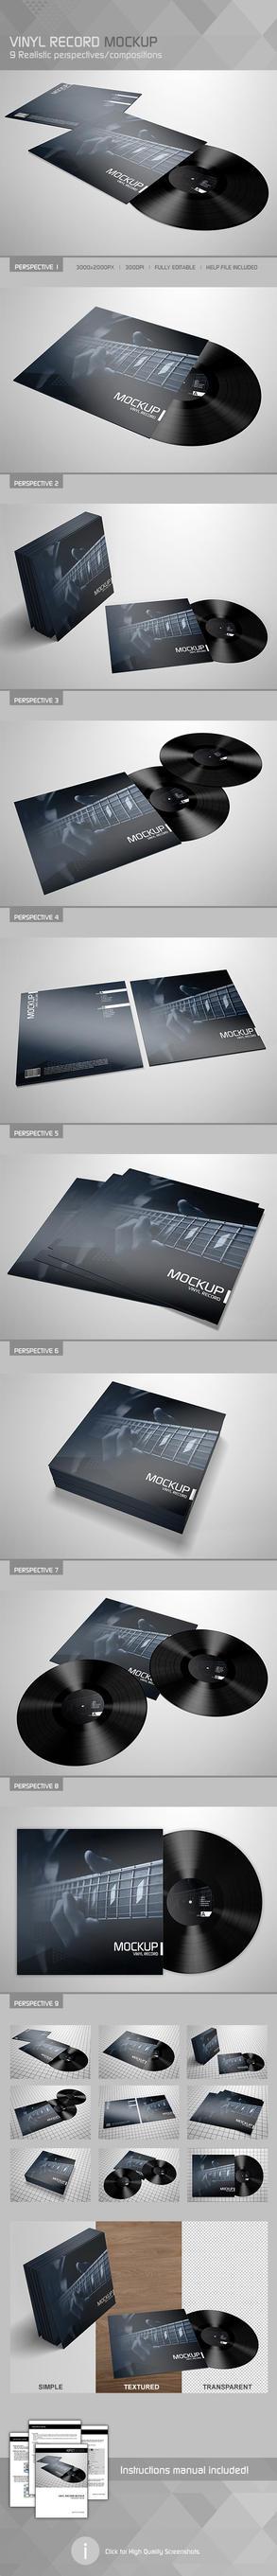 Realistic Vinyl Record Mockup by Kipet